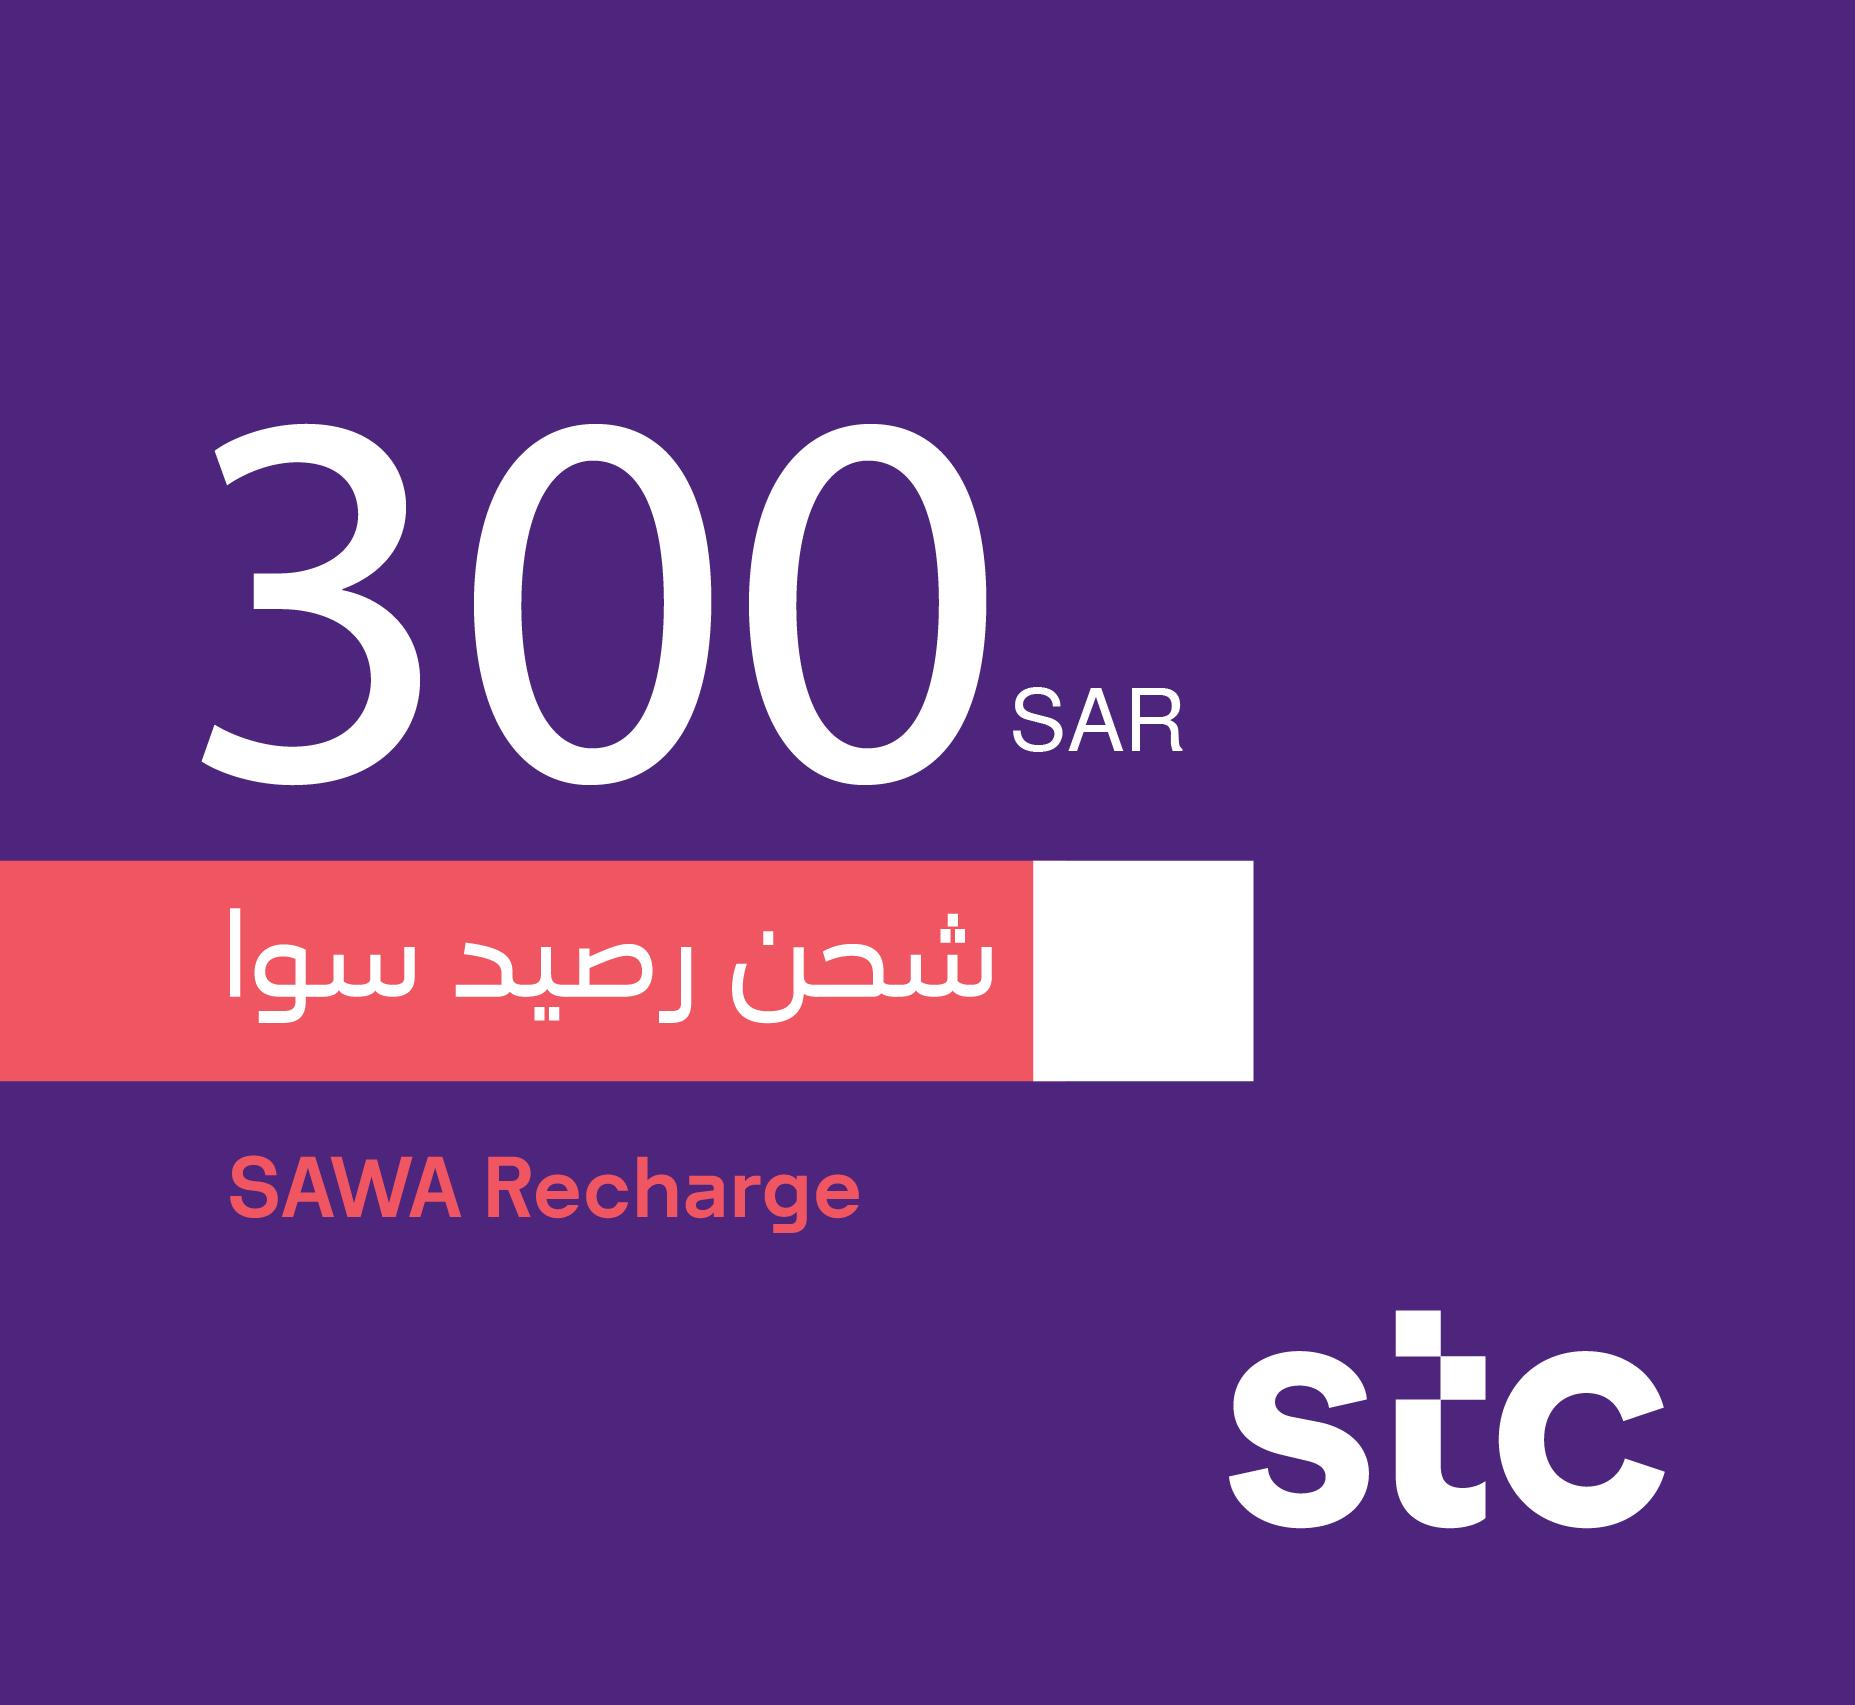 Sawa Recharge Card SR 300